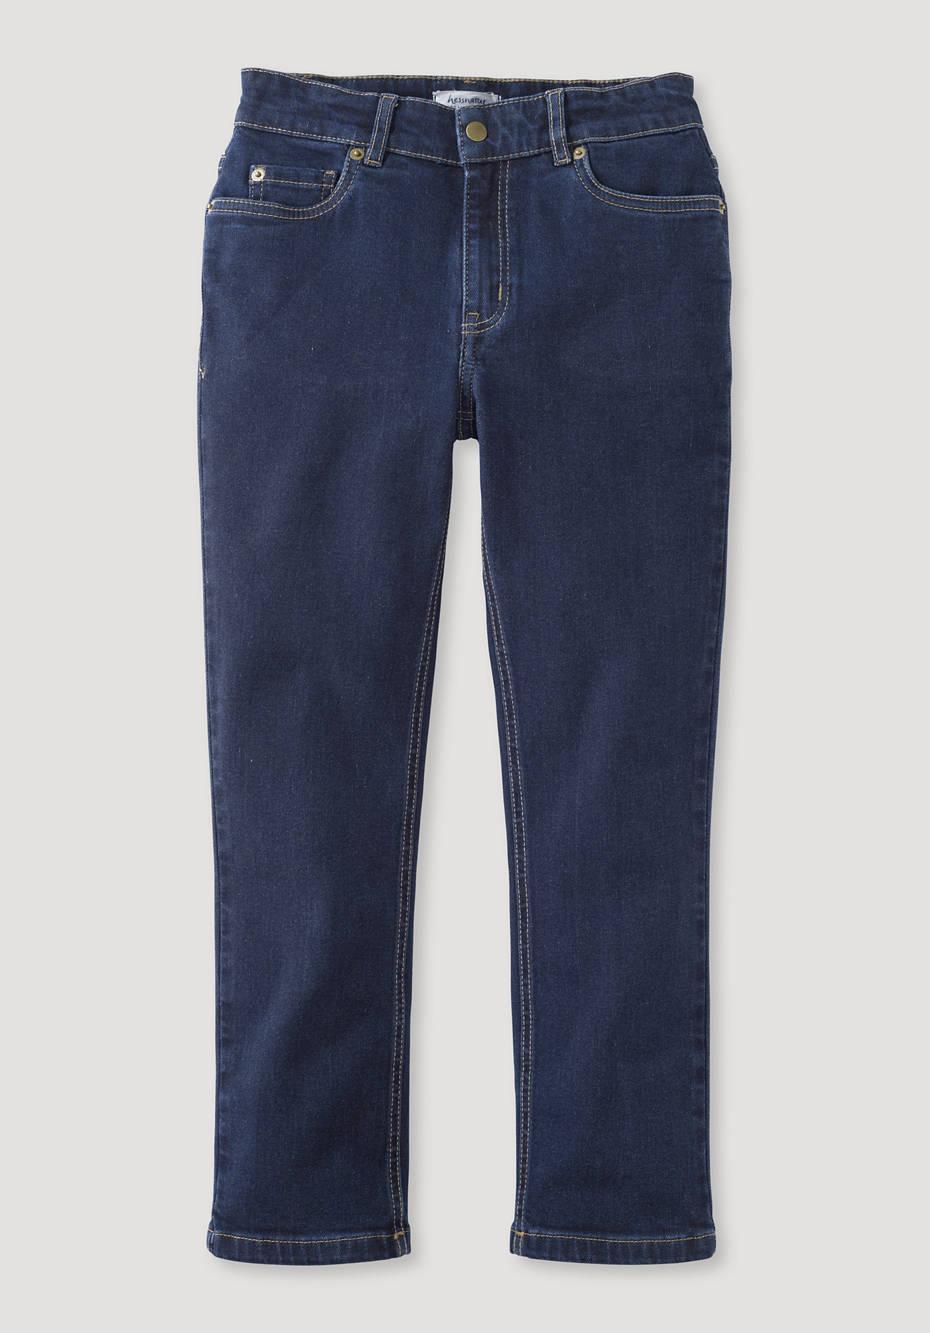 5-Pocket-Jeans Betterecycling aus Bio-Baumwolle